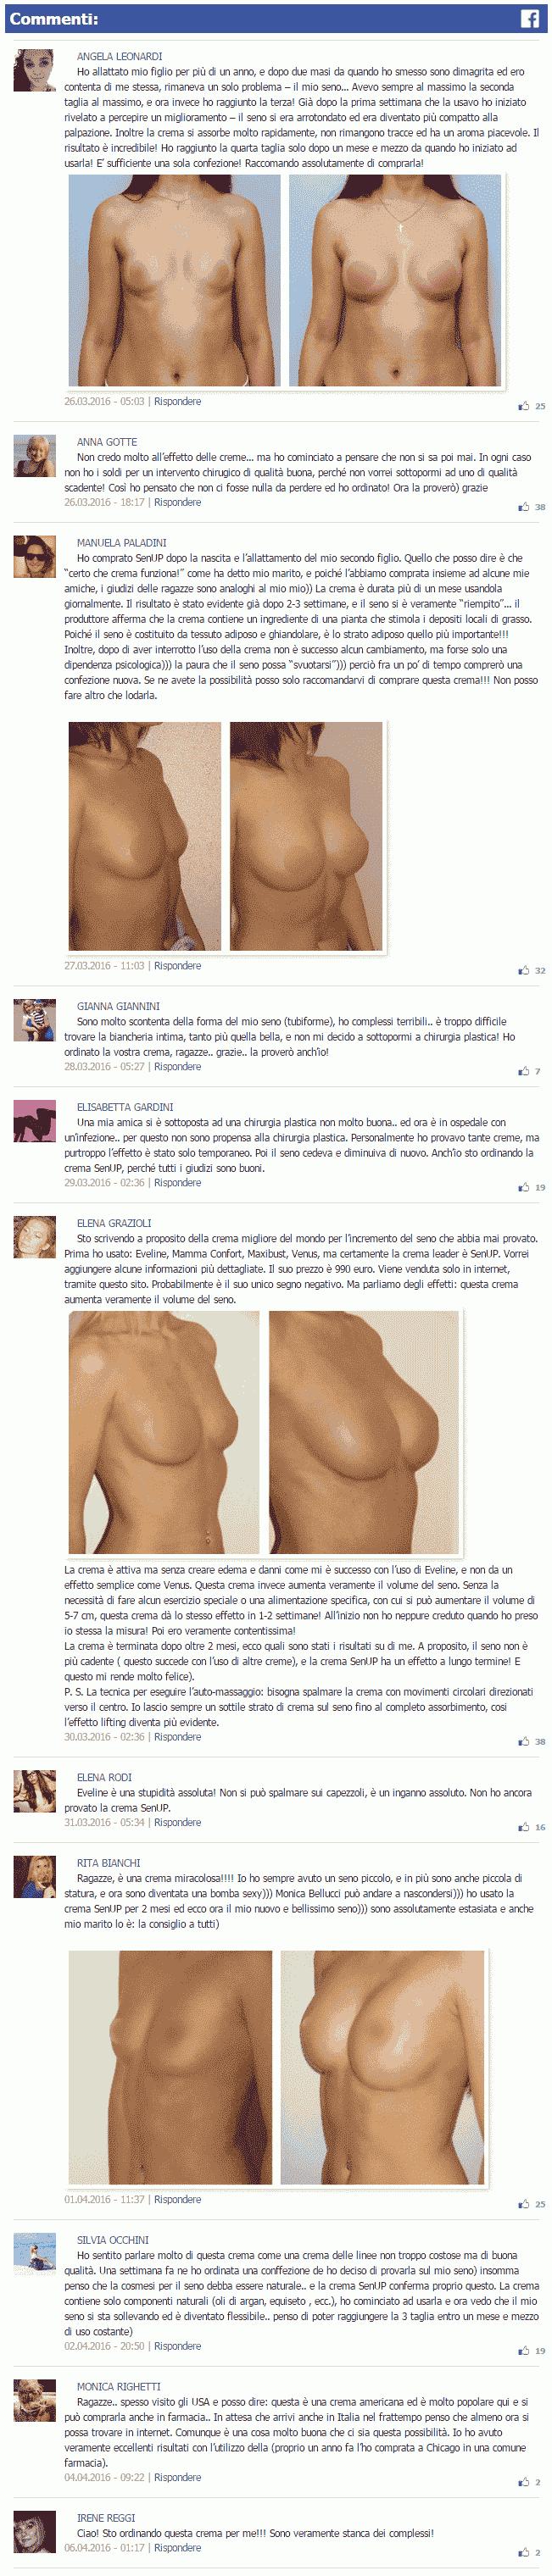 senup commenti facebook